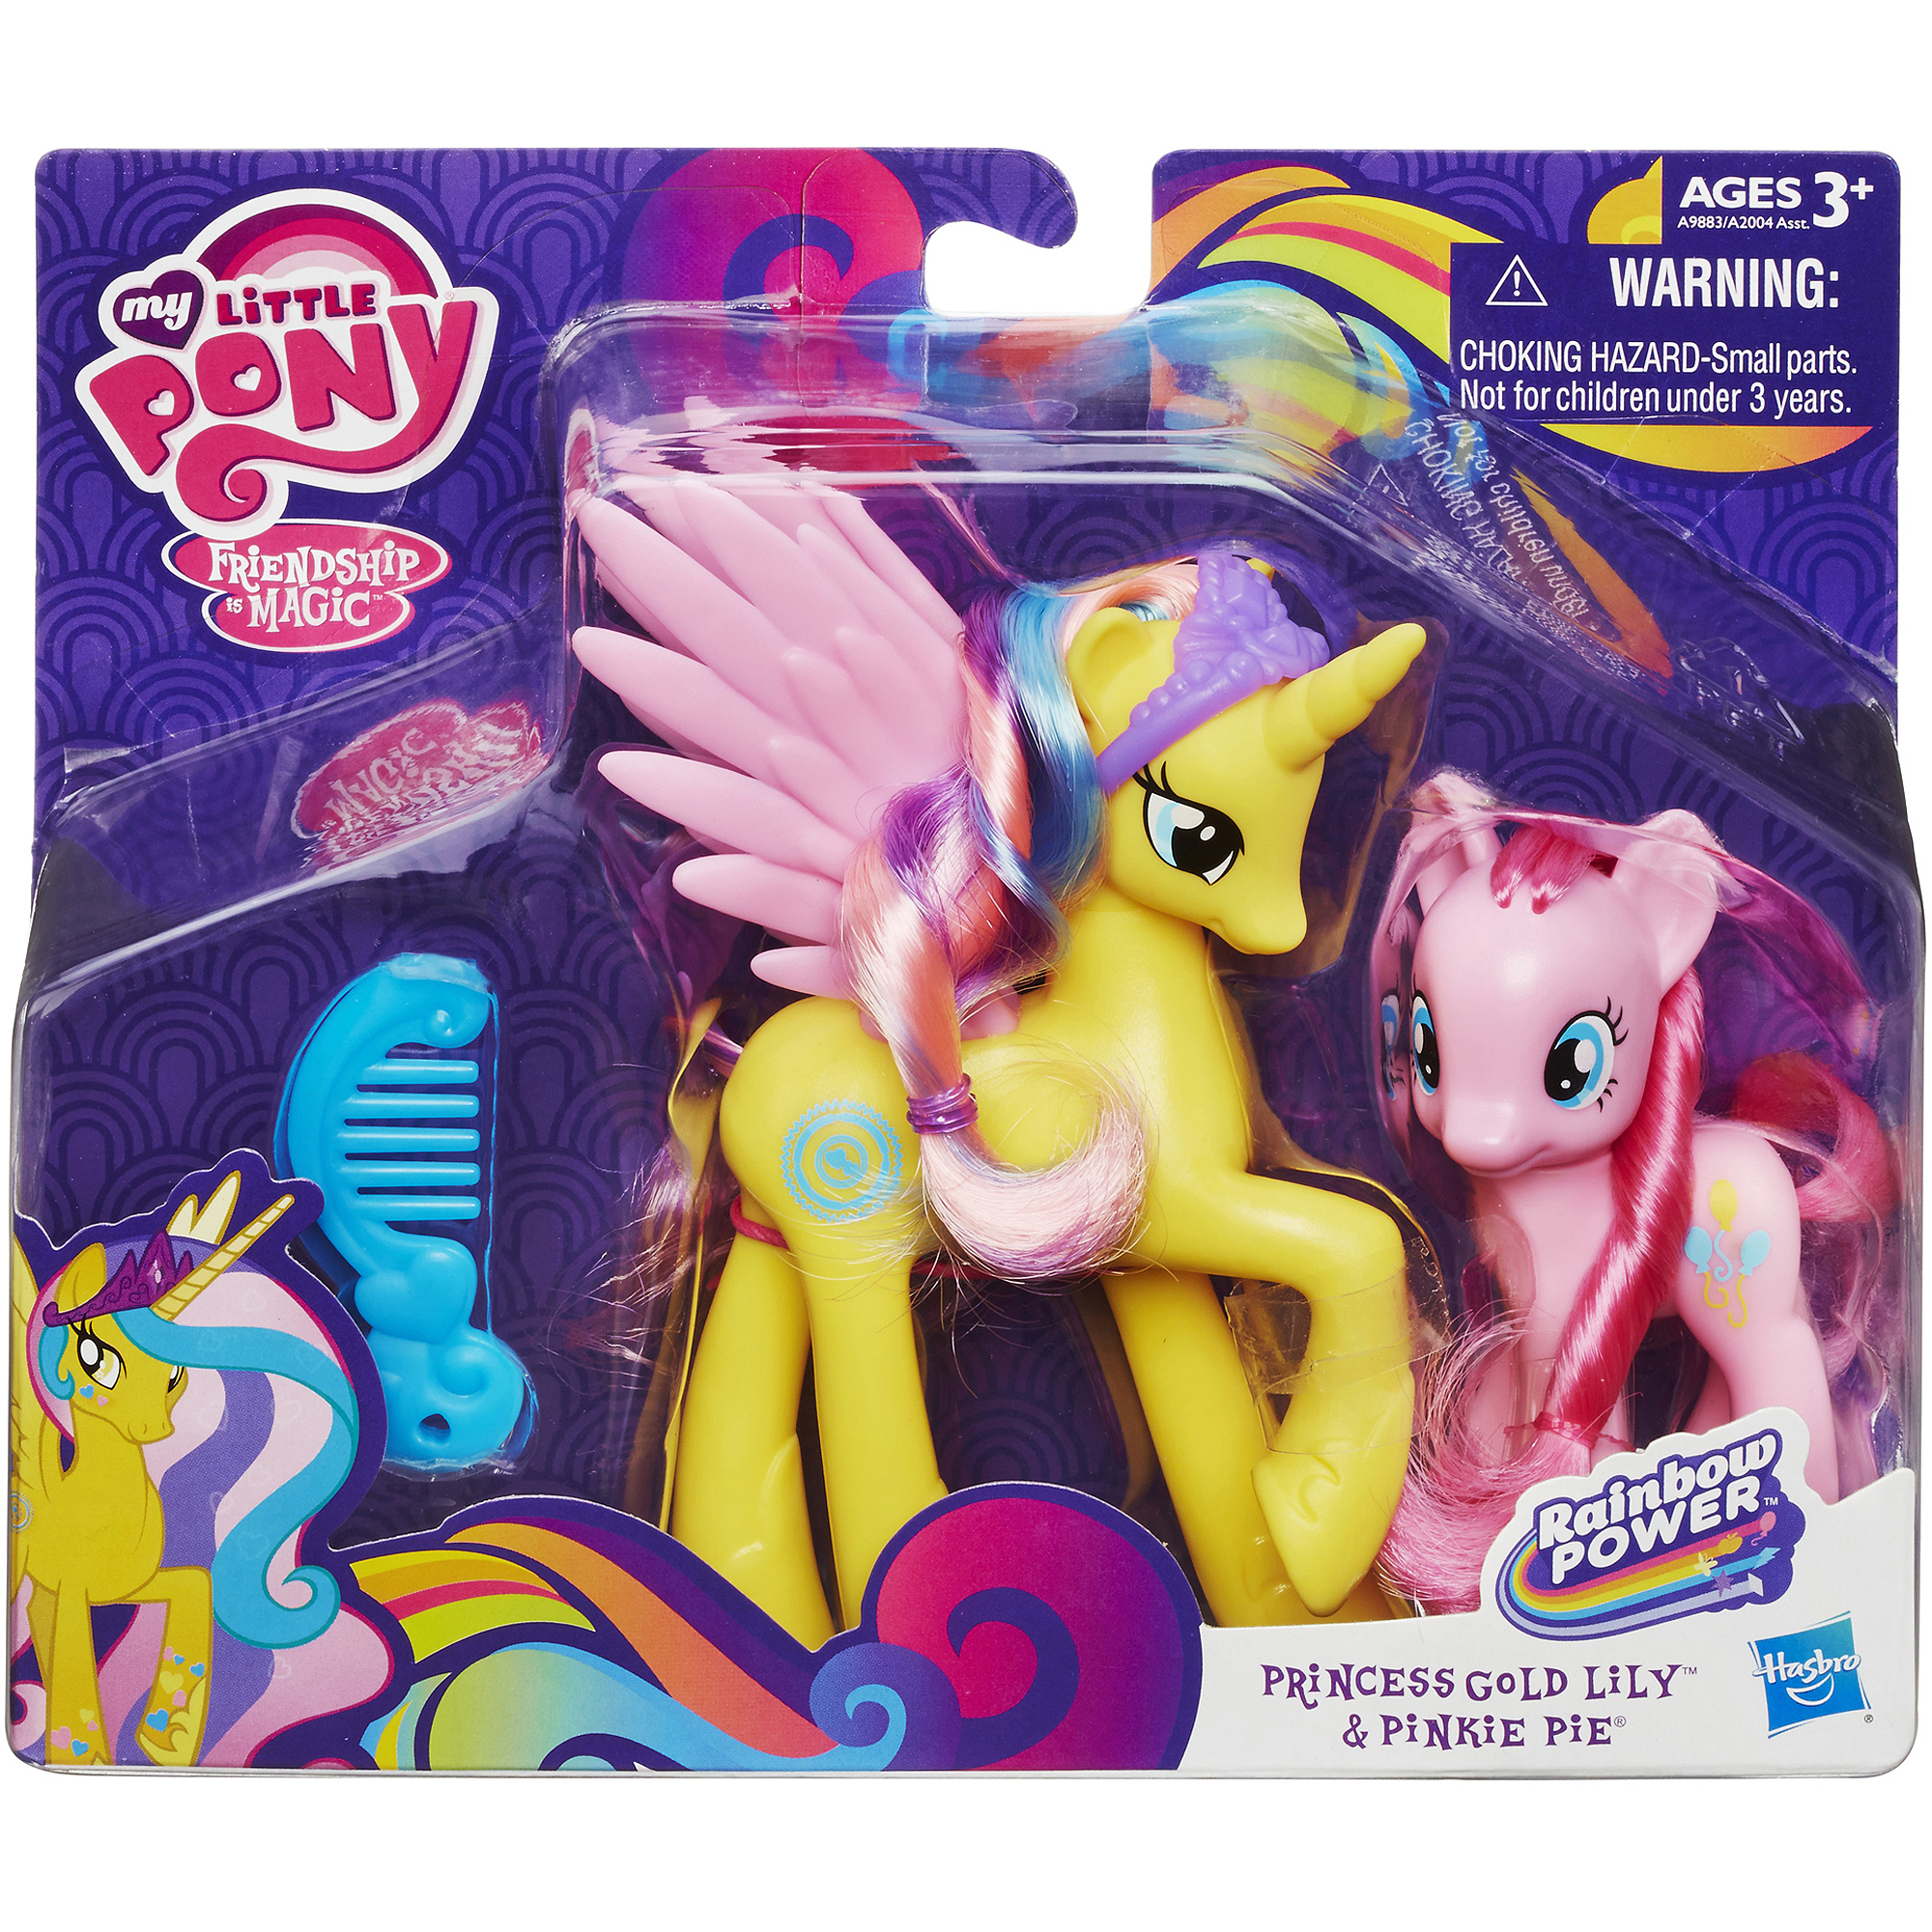 Drawn my little pony small Sunset Girls Sunset Games Friendship